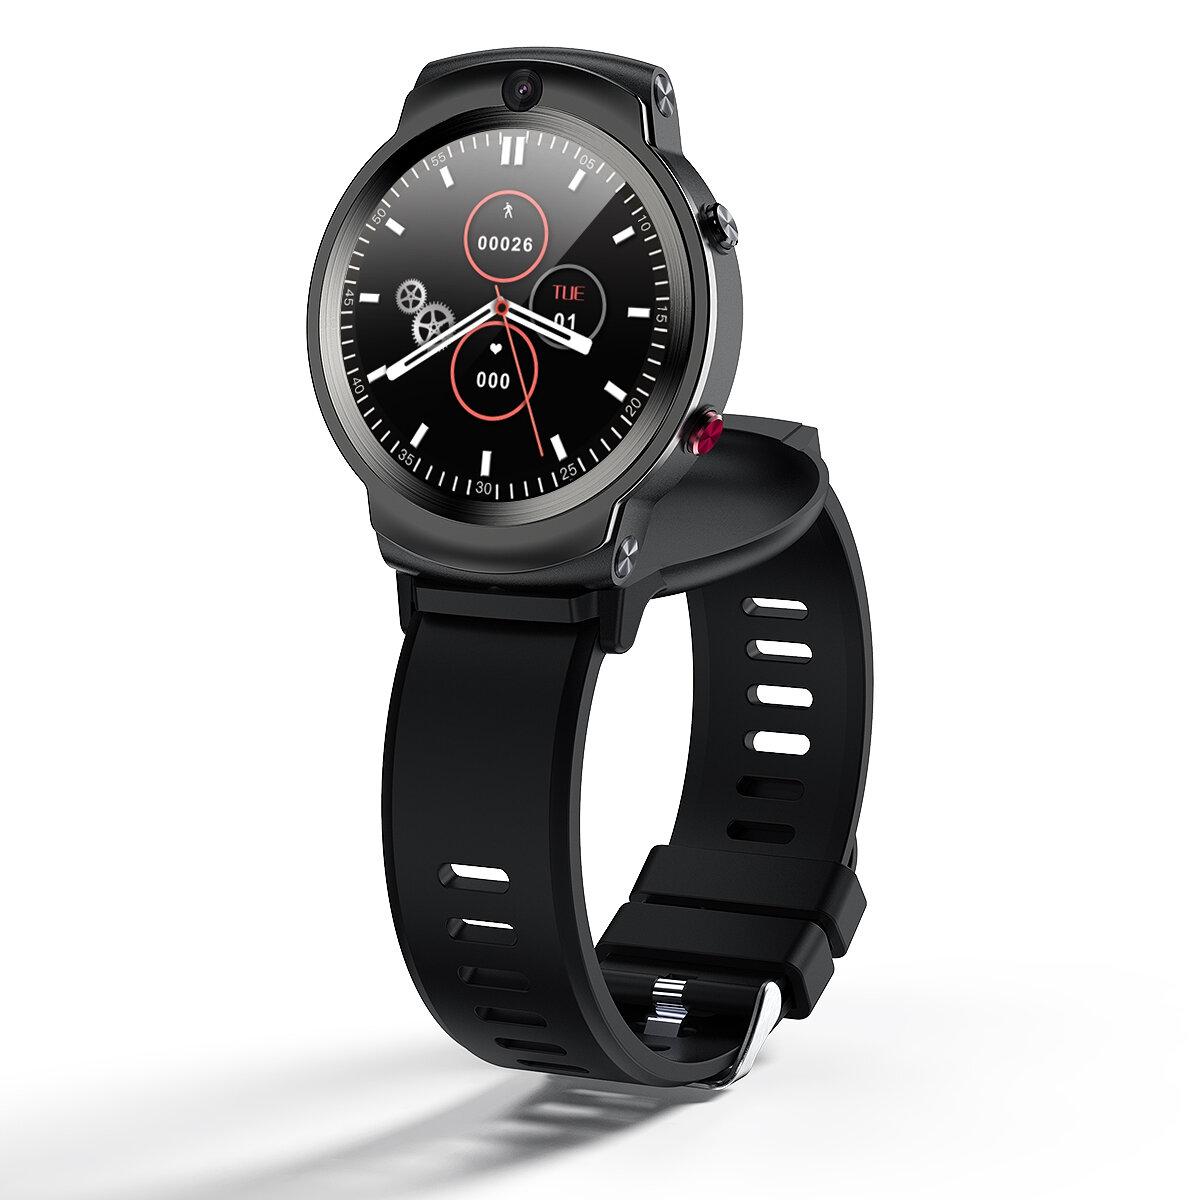 LEMFO LEM13 4G Phone Watch